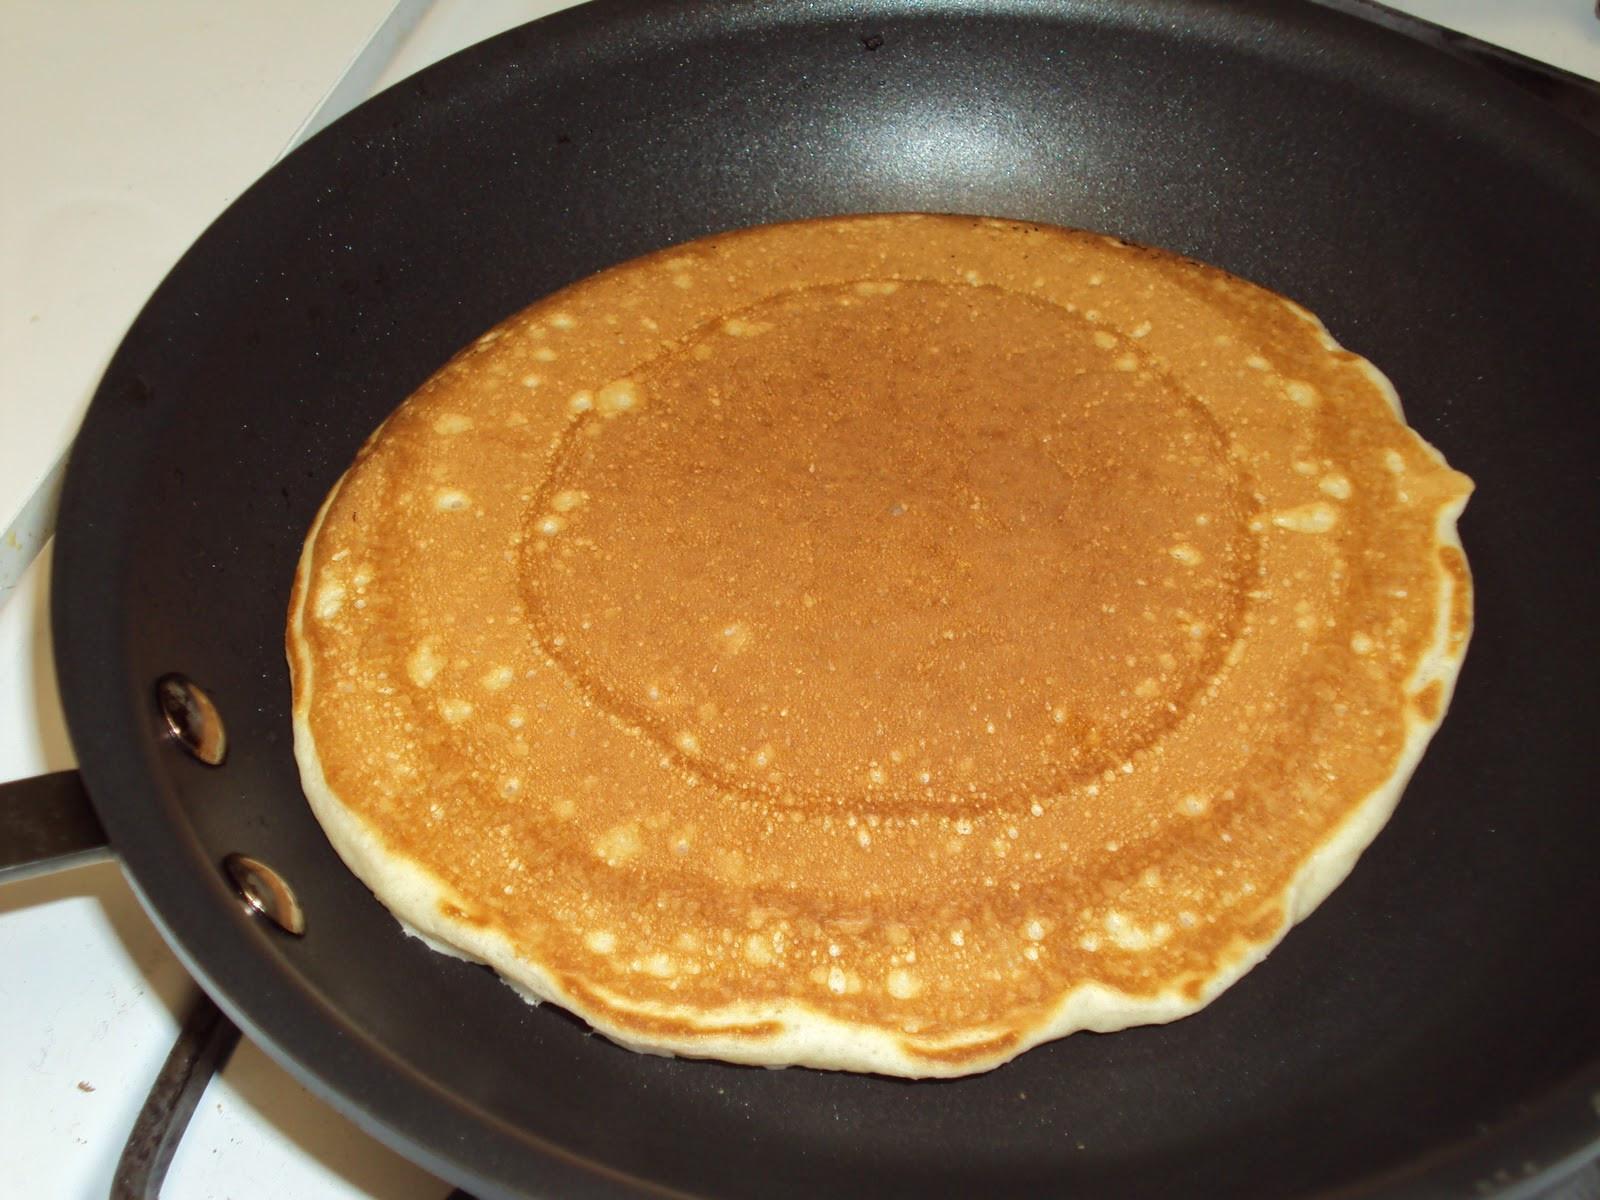 Home Made Pancakes  The Cupcake Massacre Homemade Pancakes